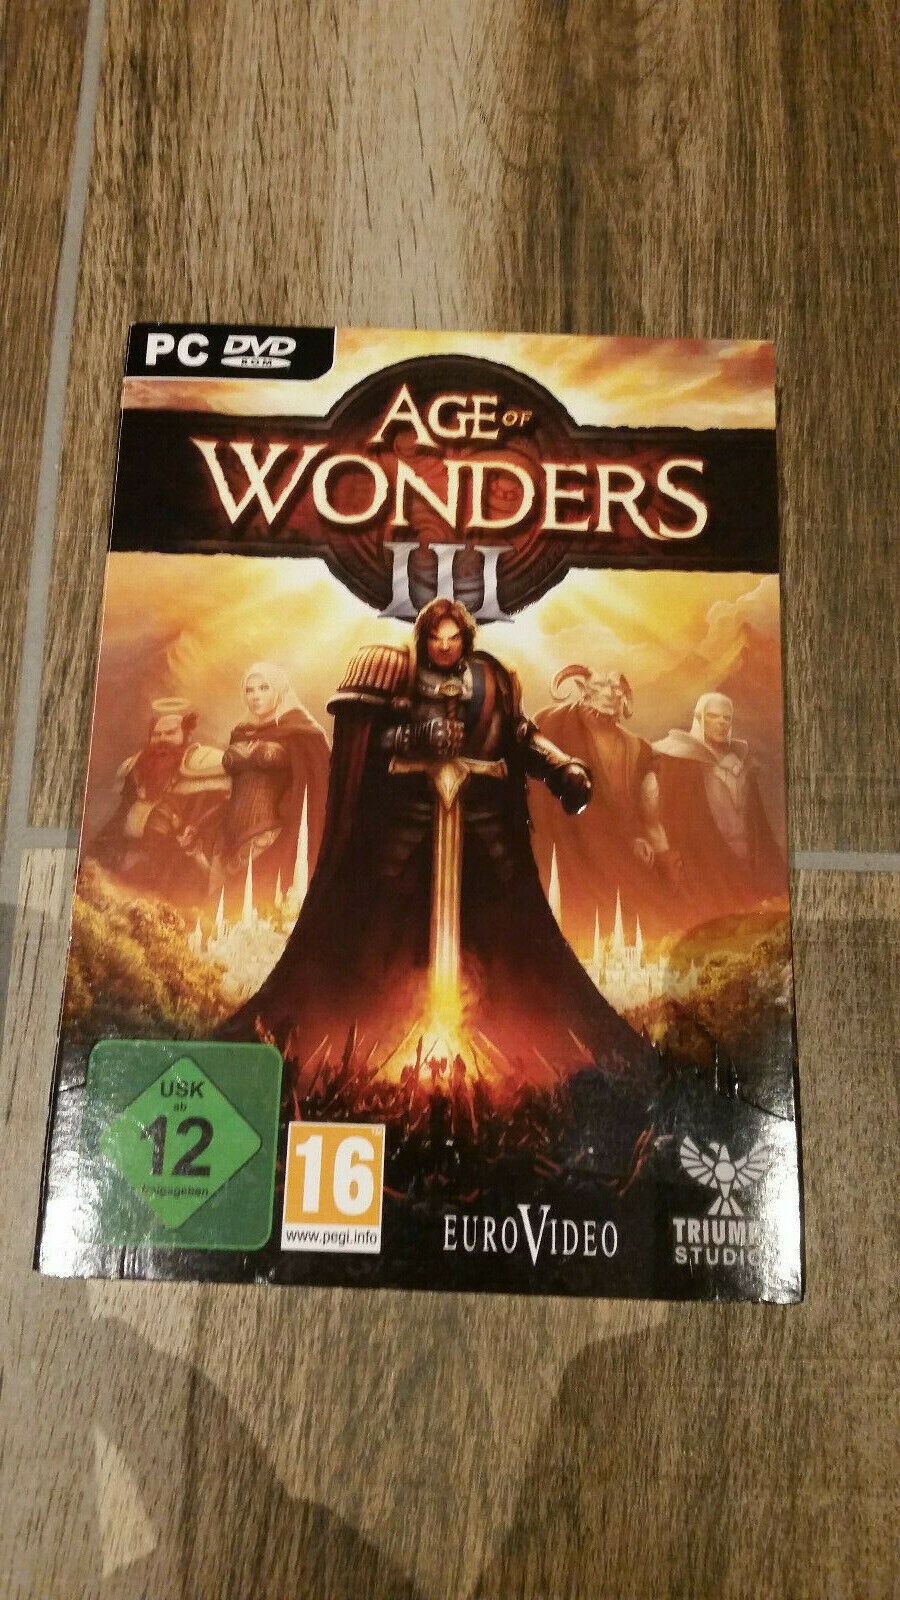 PC DVD Age of Wonders 3 III - Fantasy + Strategie-Rollenspiel - NEU & OVP